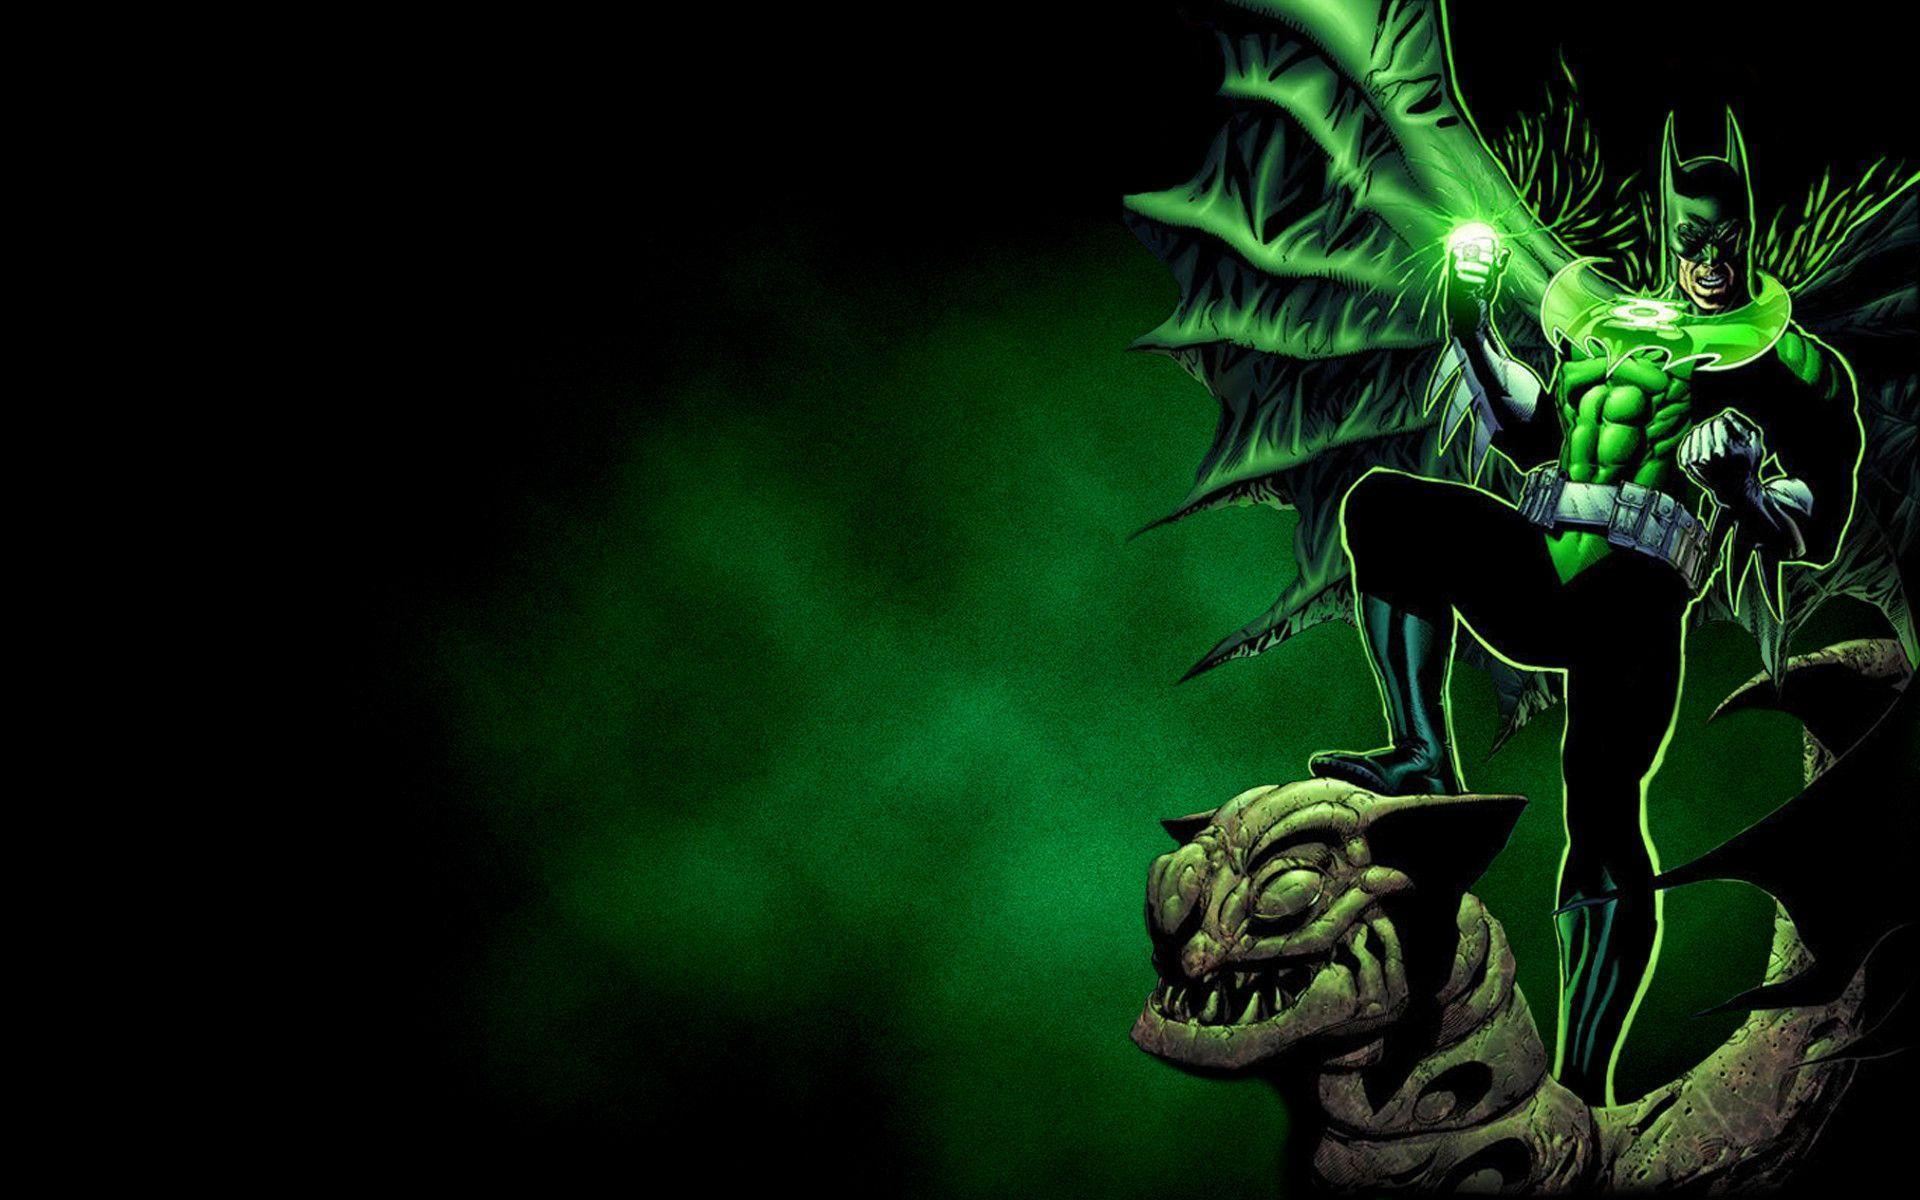 green lantern oath wallpaper - photo #38